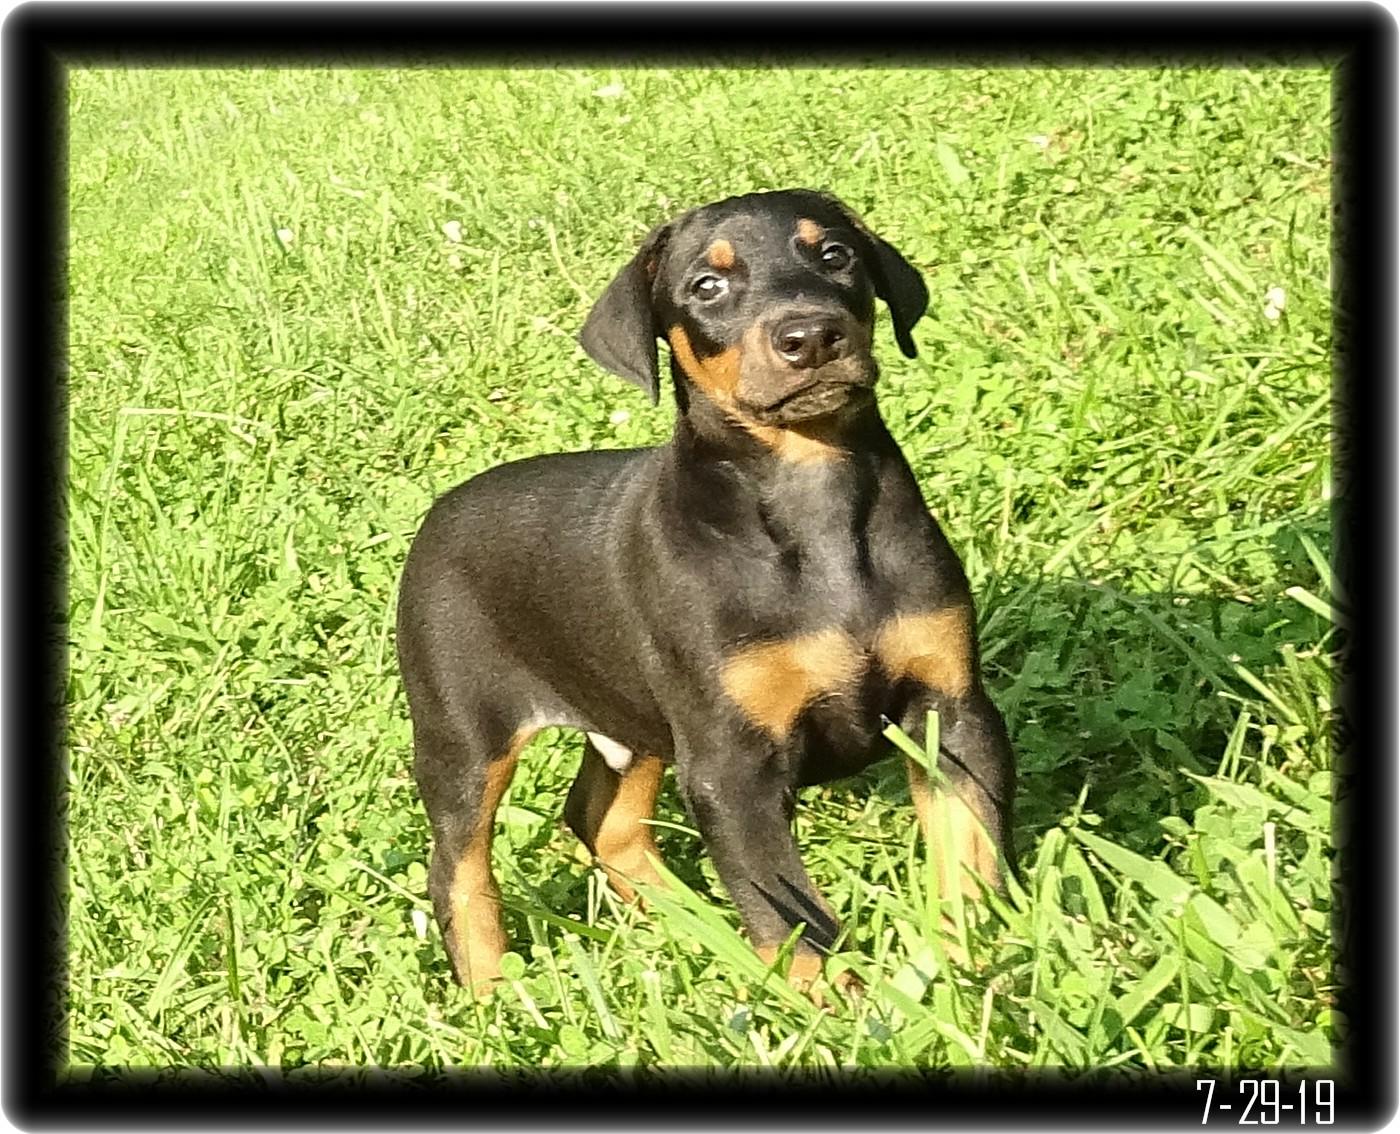 Nitro was Milo ... Miska and Kodiak's kid born 6-10-19 ... Cordova Tn. - Established client